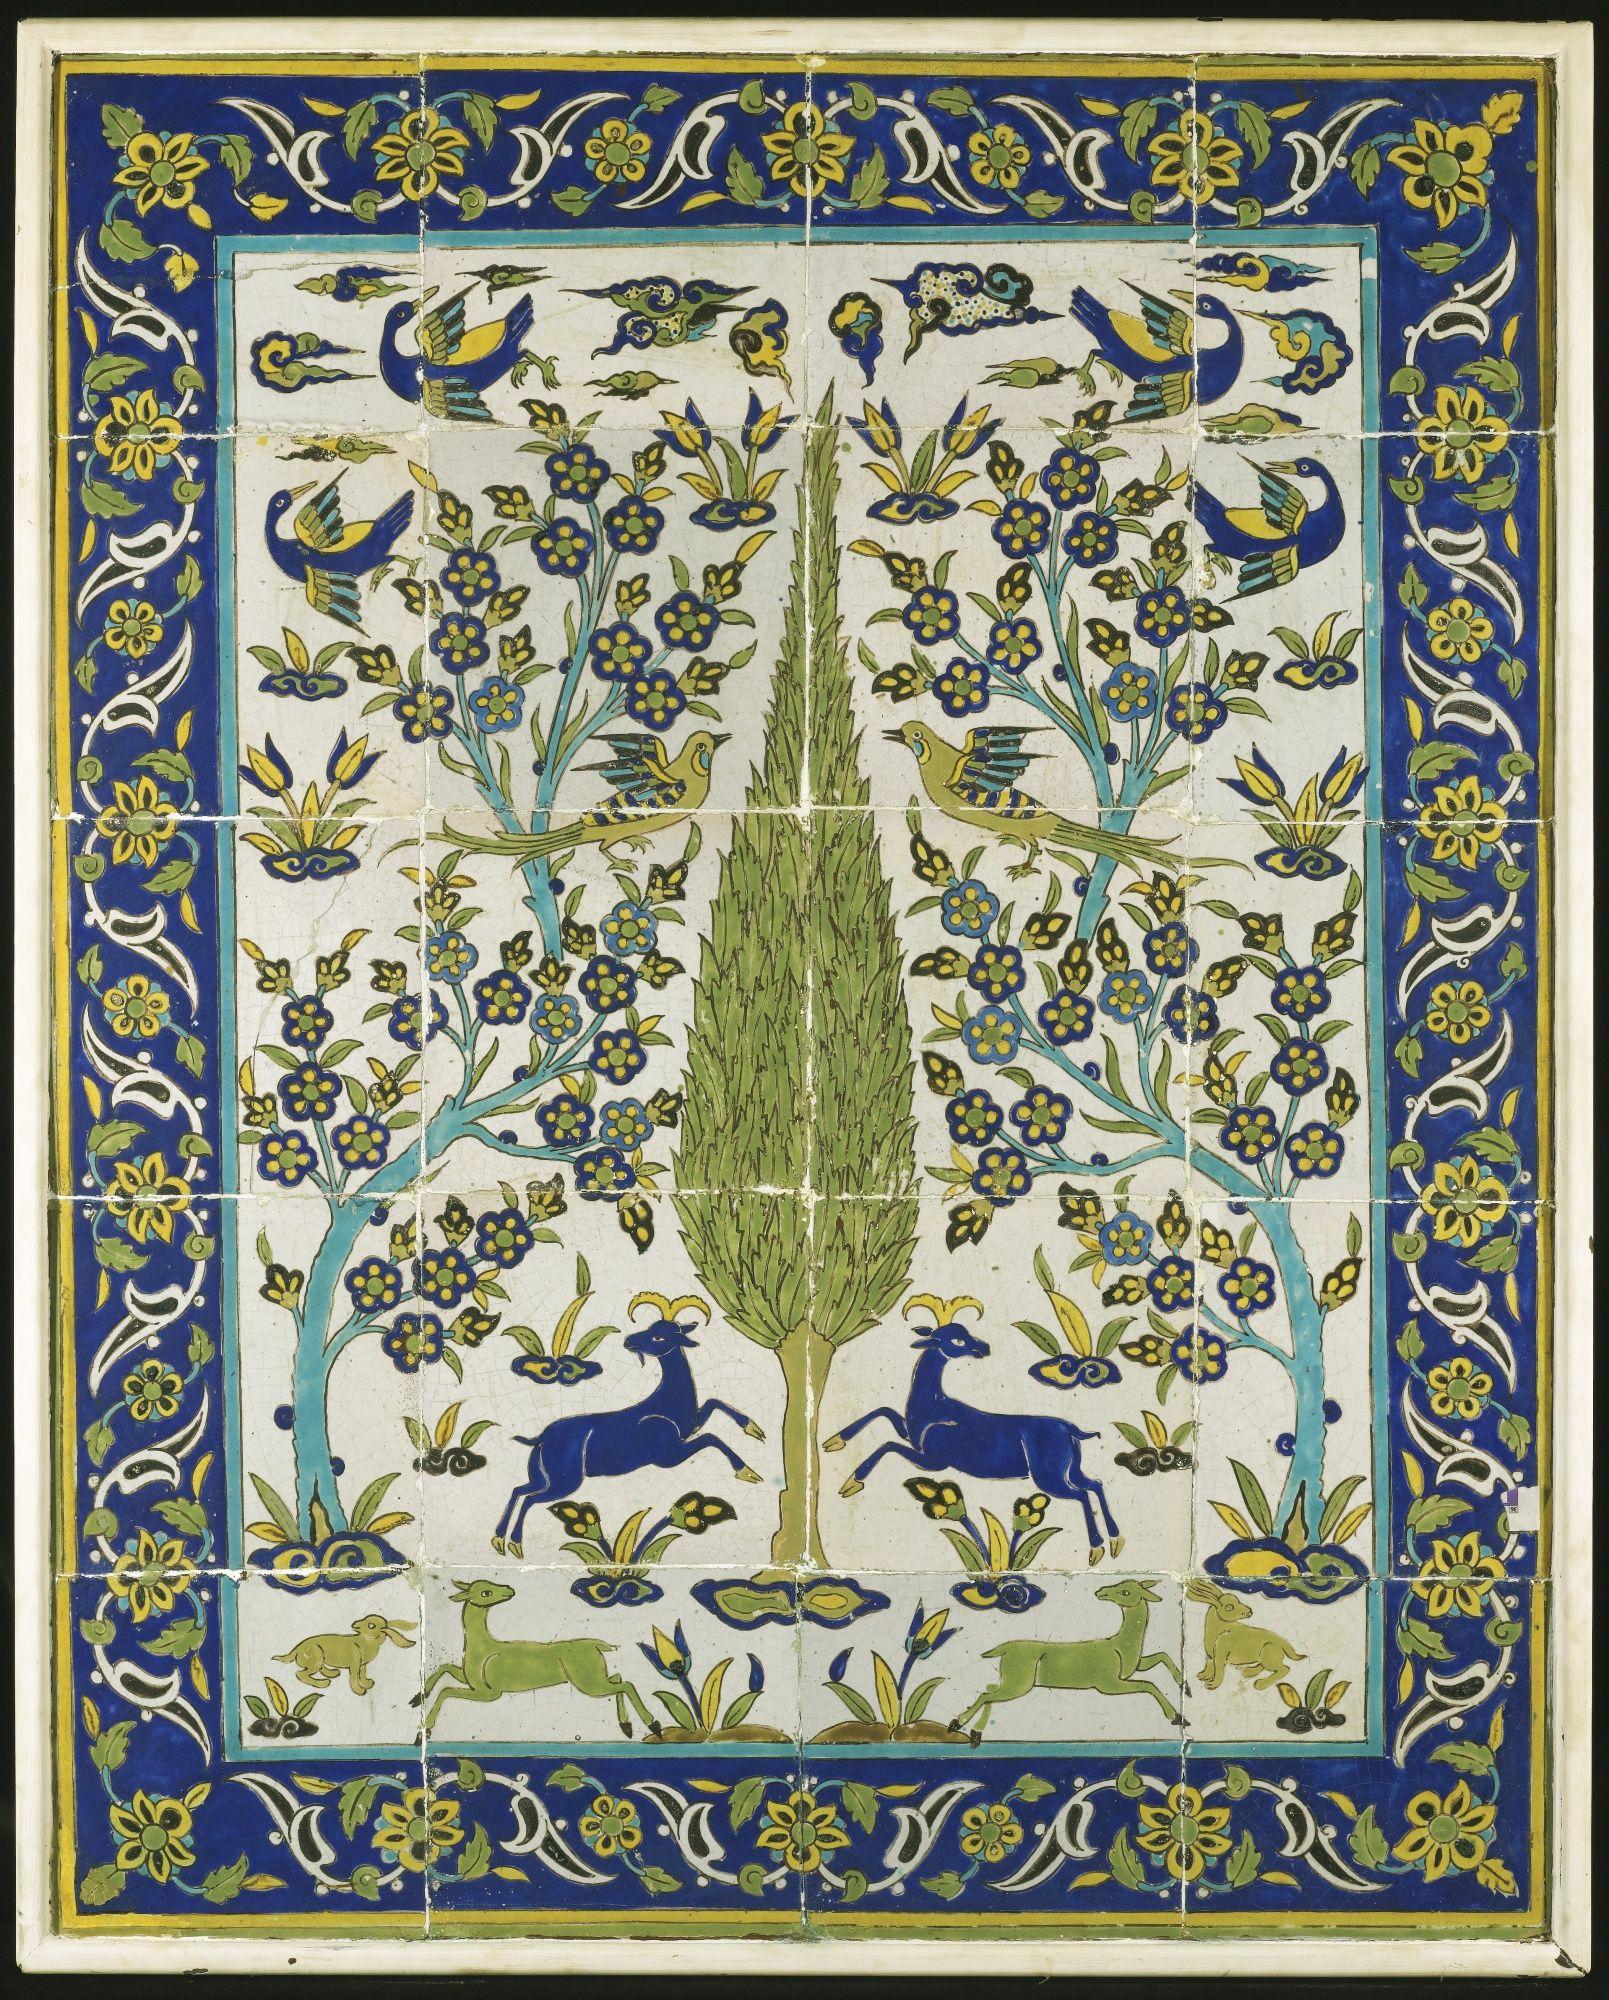 A Safavid Cuerda Seca Tile Panel, Persia, 18th Century | Safavid Art